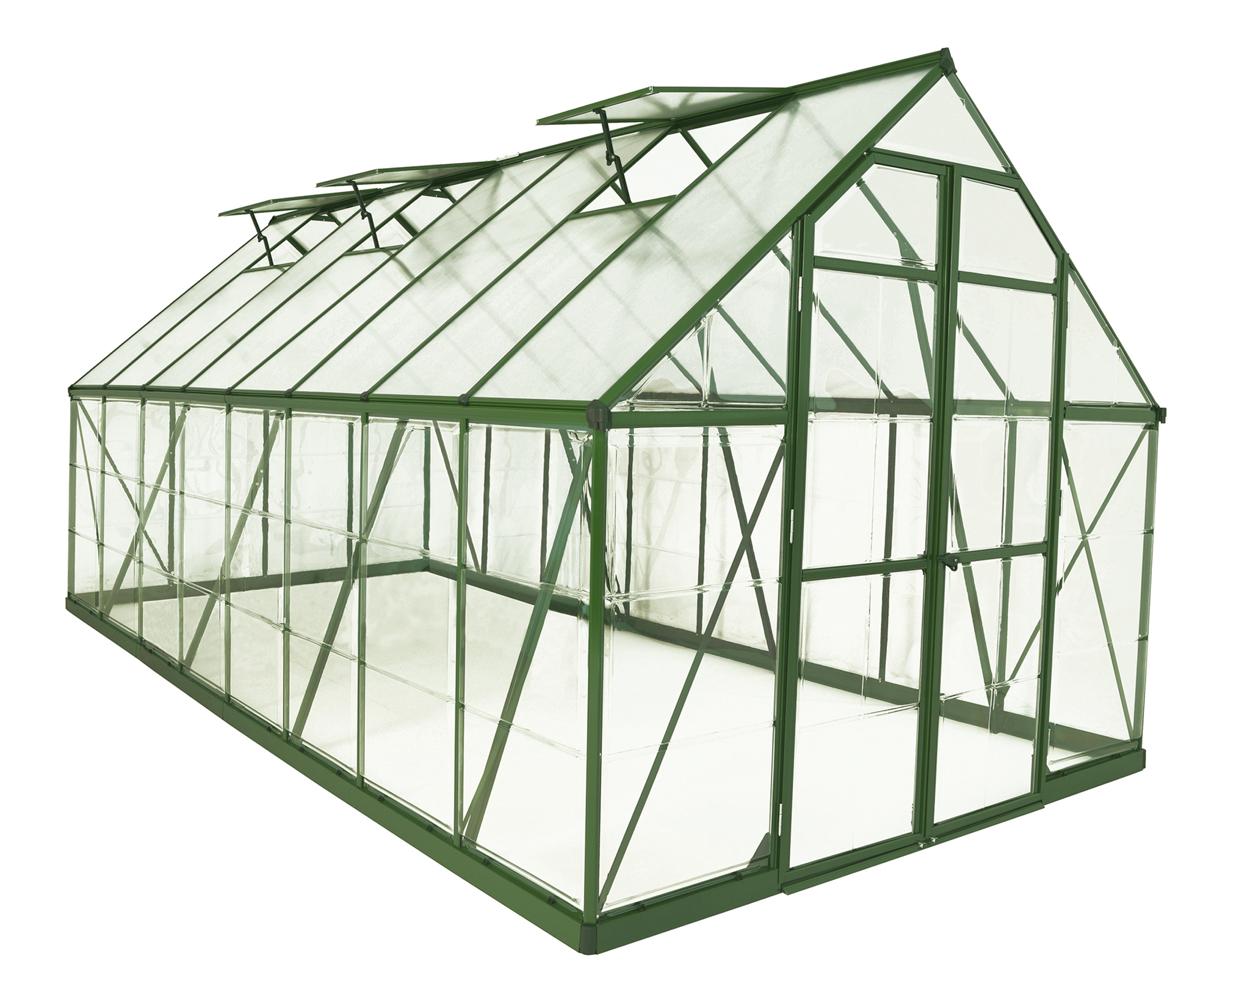 Balance 8' x 16' Greenhouse